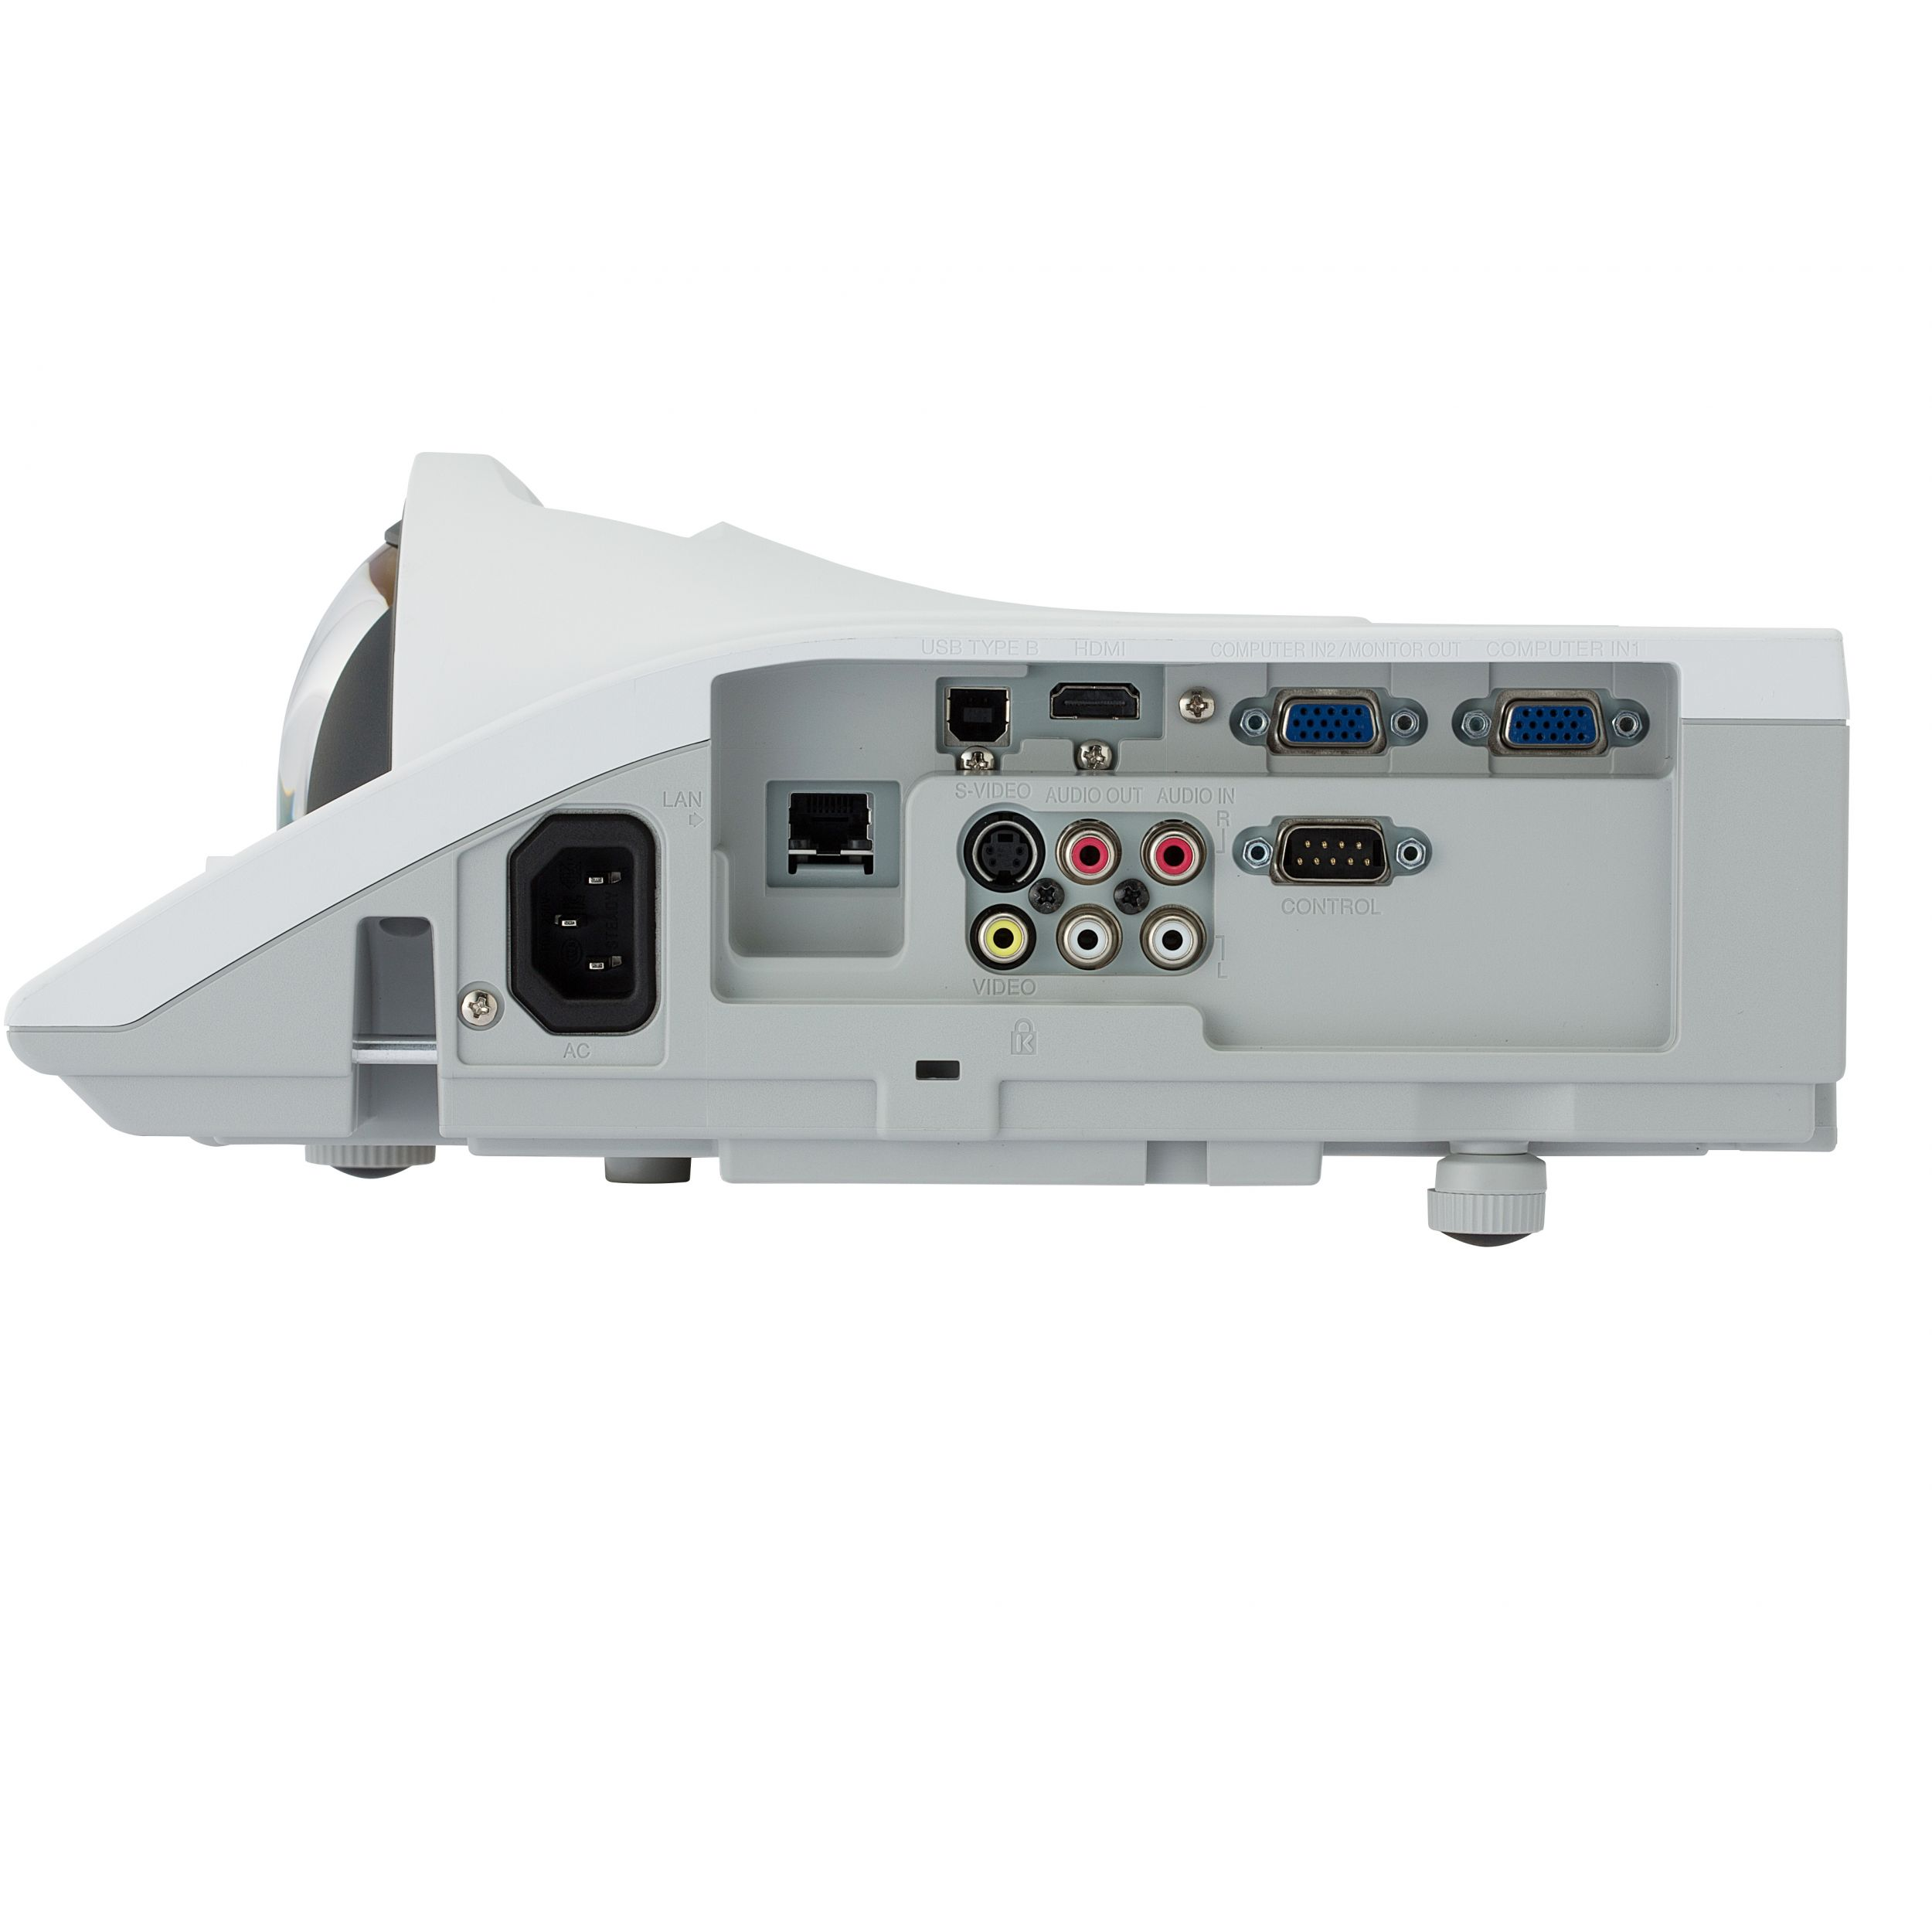 projektor Hitachi CP-CX251 Hitachi o ultrakrótkiej ogniskowej